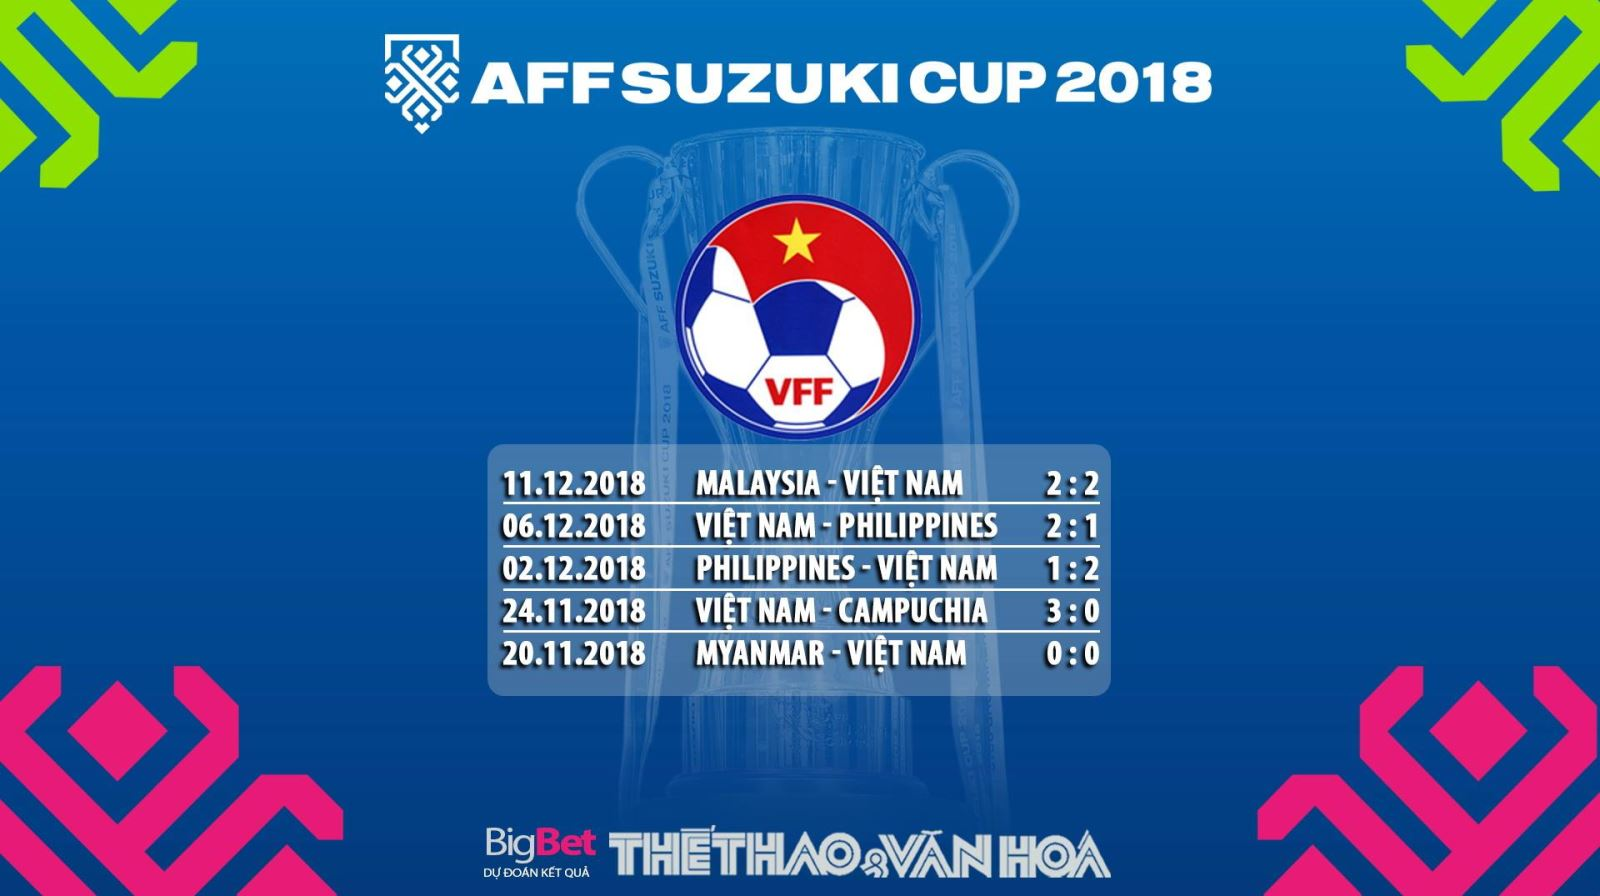 VIỆT NAM vs Malaysia, Malaysia vs VIỆT NAM, Mã Lai vs Thái, Thái vs Mã Lai, VIỆT NAM, Malaysia, Mã Lai, Thái, đội tuyển VIỆT NAM, đội tuyển Malaysia.